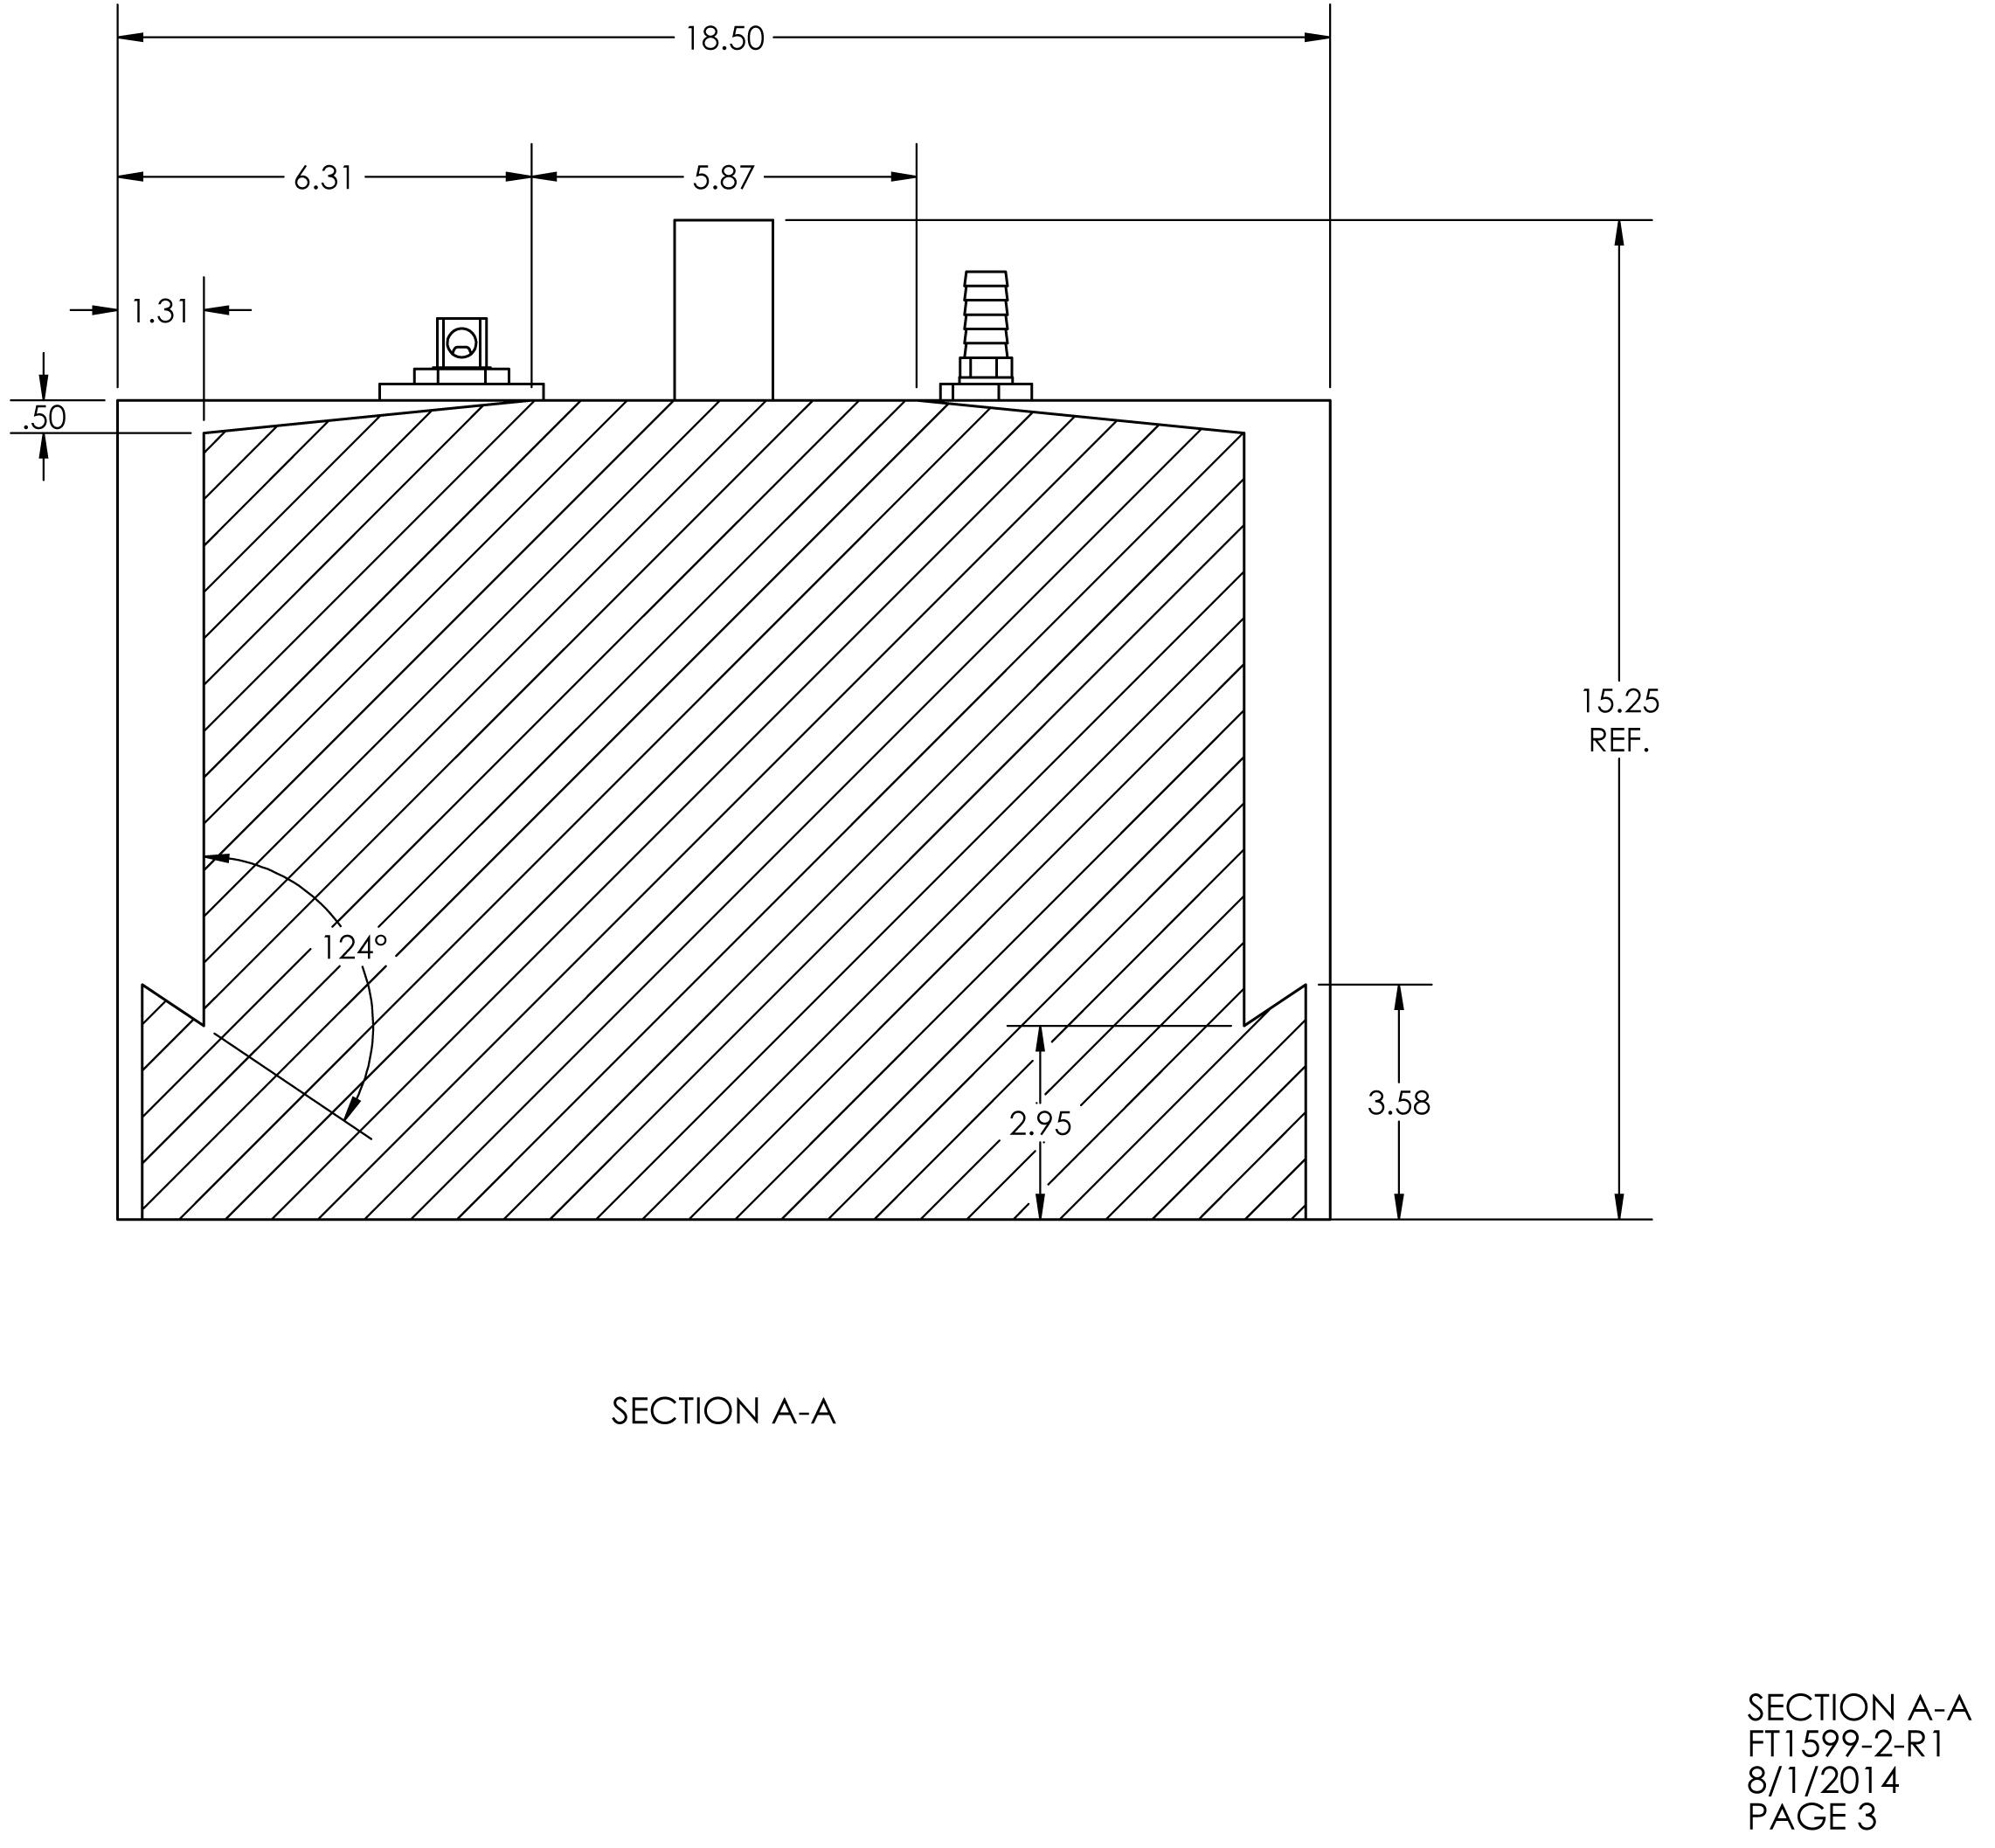 15 Gallon Rectangular Shaped Fuel Tank 18 5 X 17 75 X 12